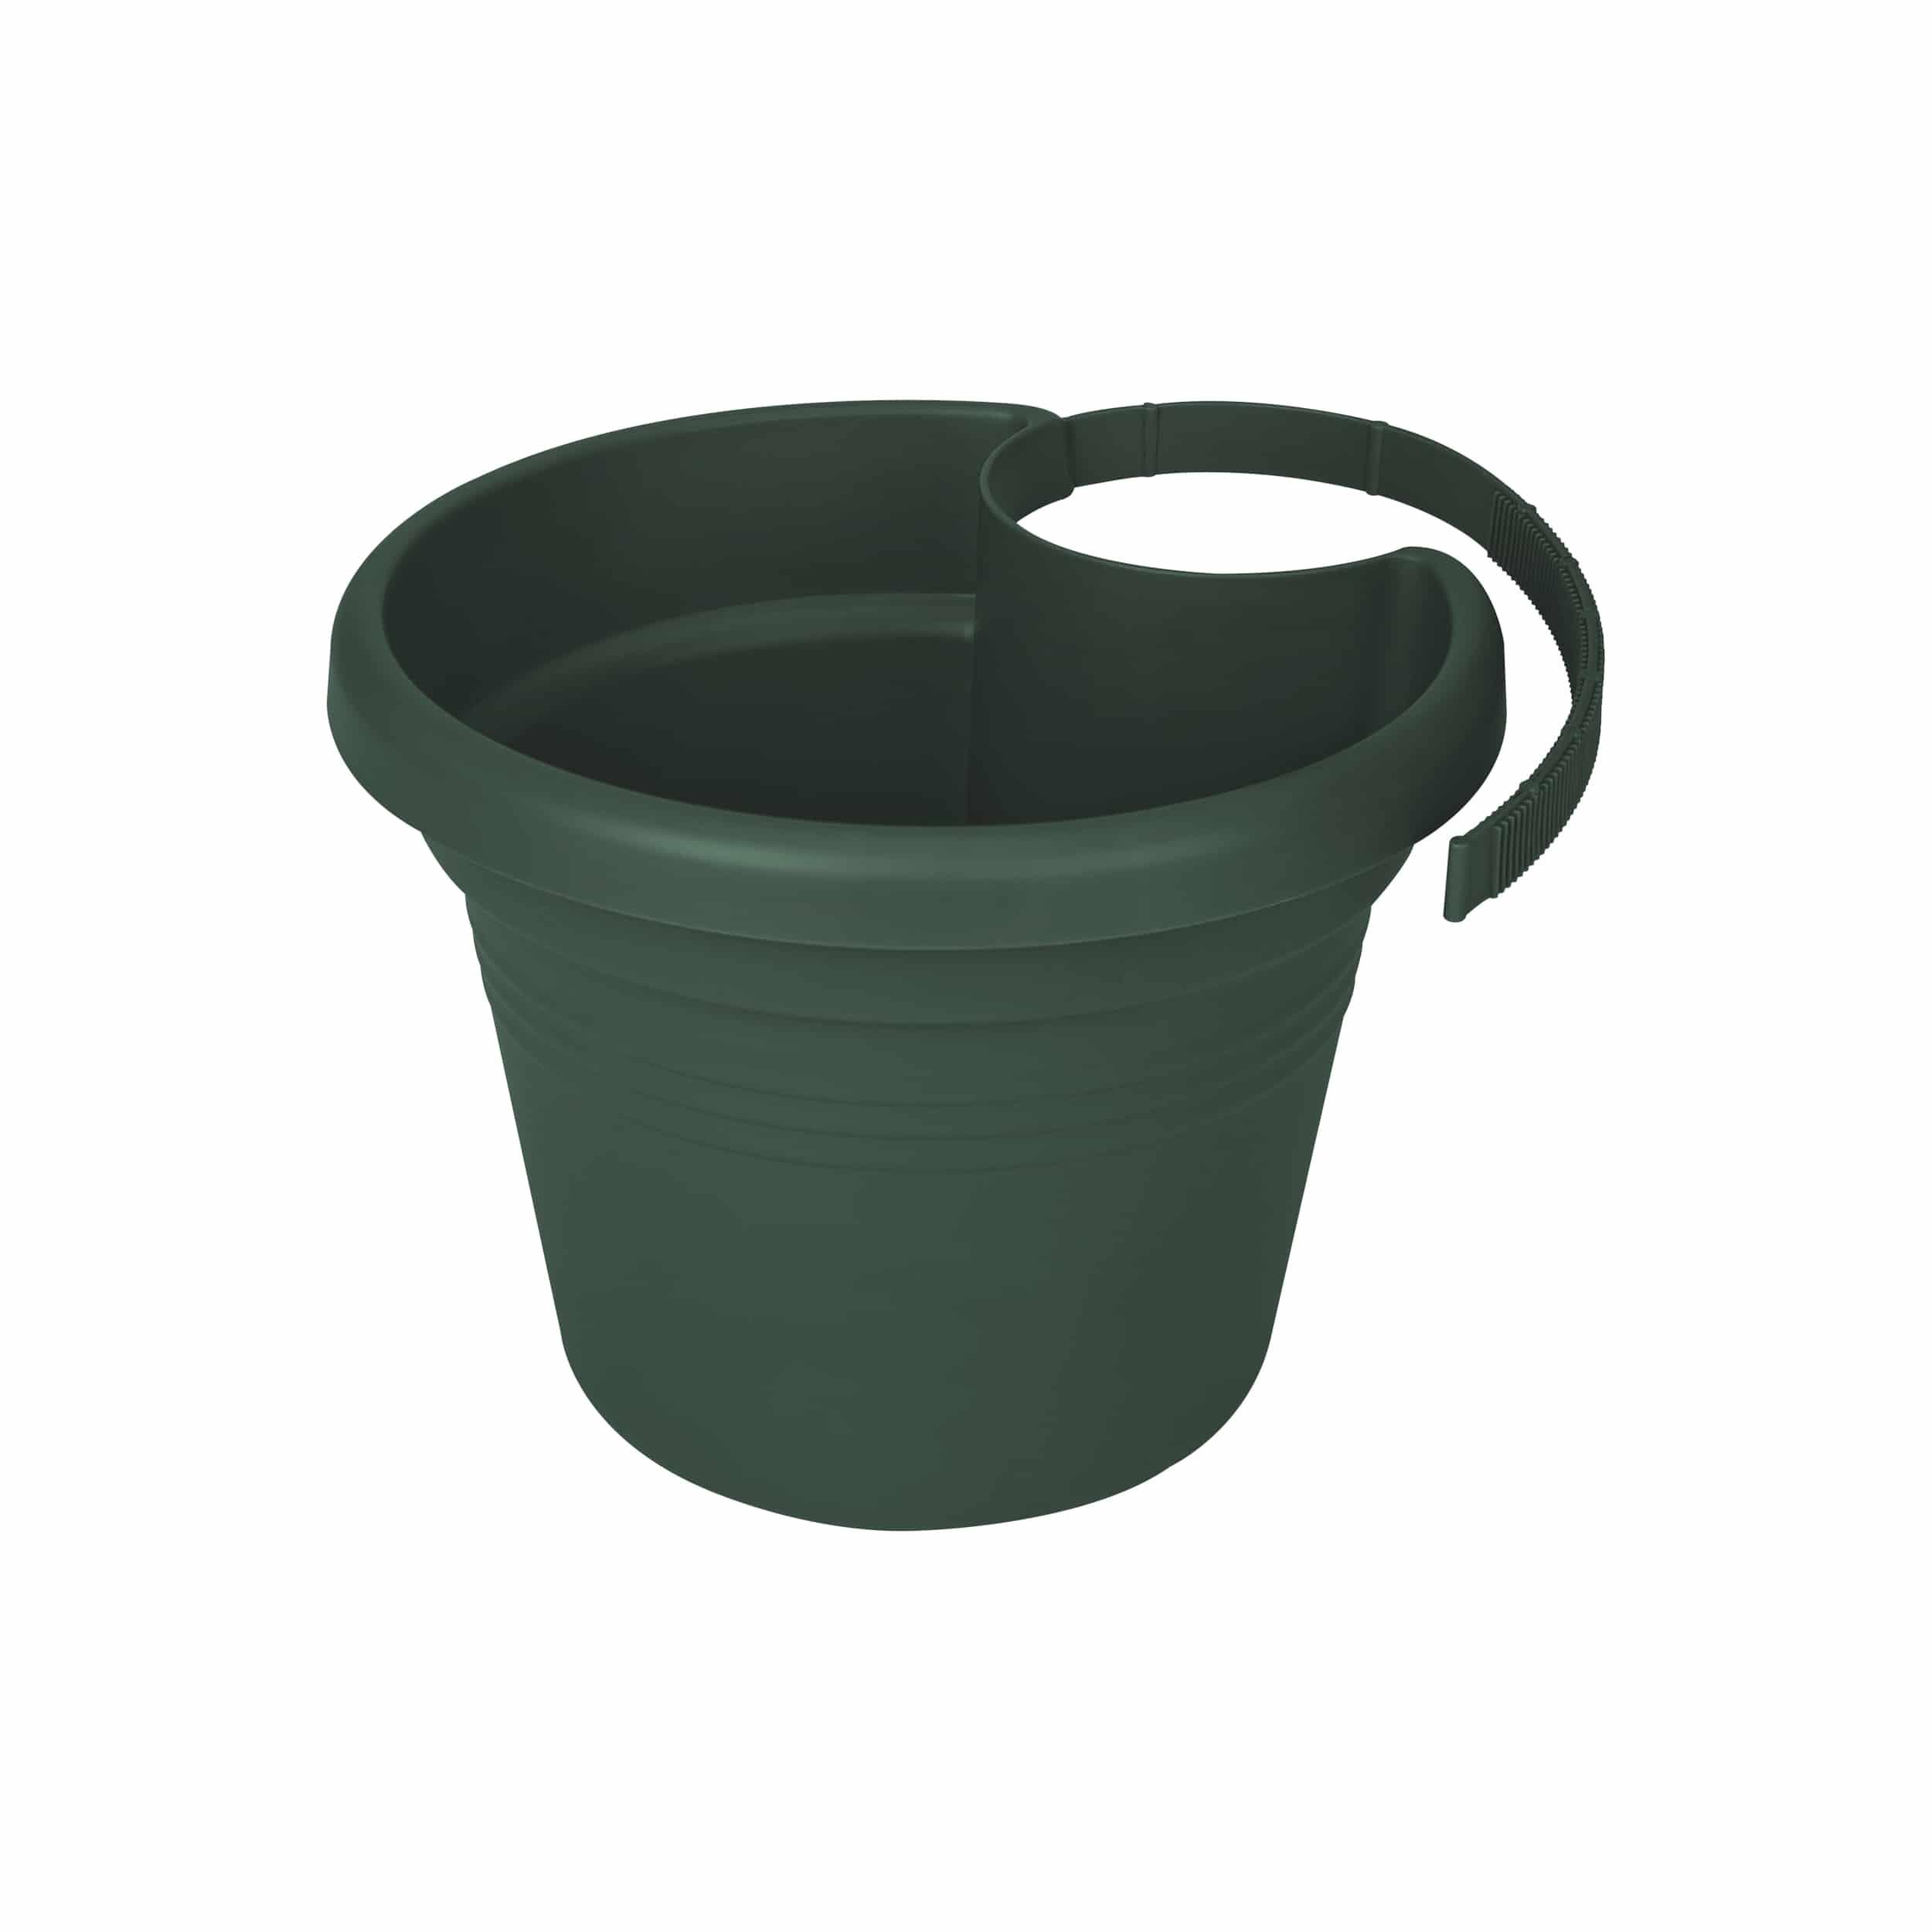 Regenrohrpflanzgefäß Green Basics D23cm laubgrün